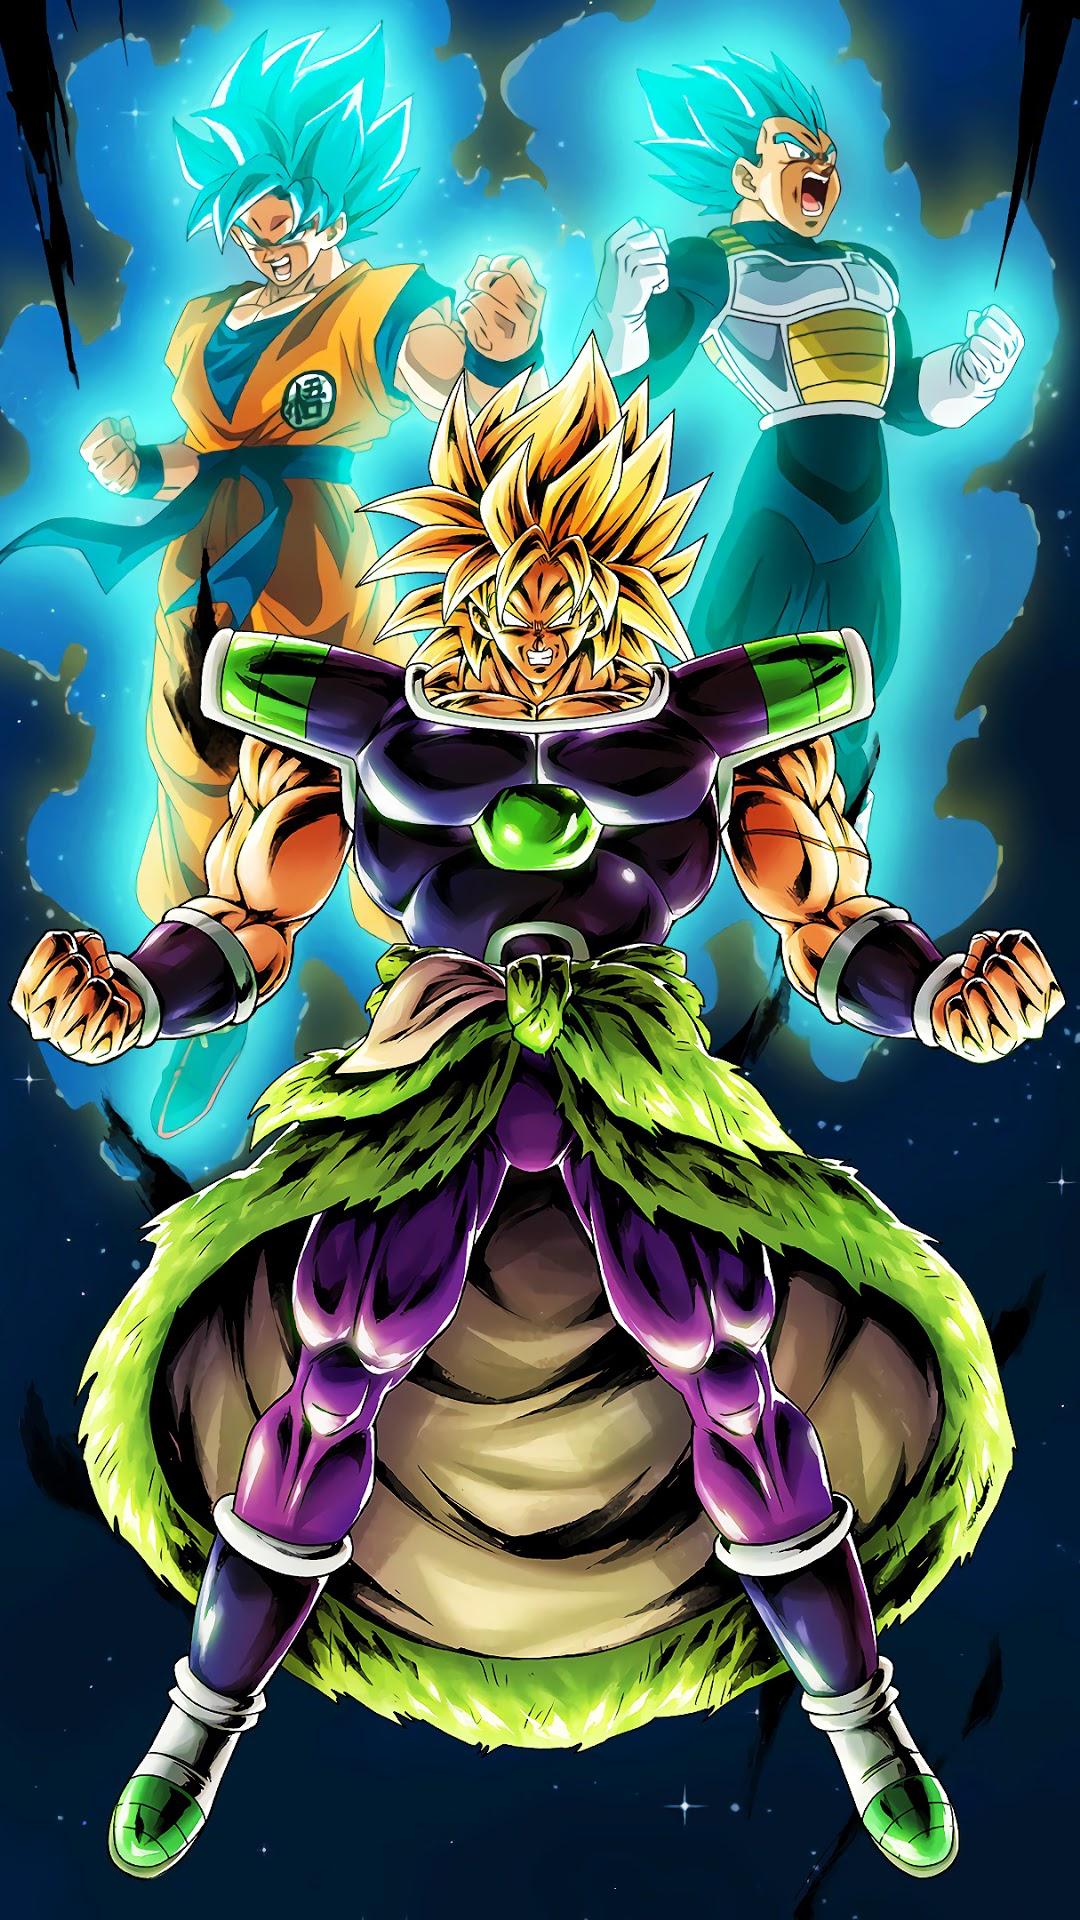 Dragon Ball Super Fond D Ecran Anime Figurine Personnage Fictif Illustration Oeuvre De Cg 22255 Wallpaperuse